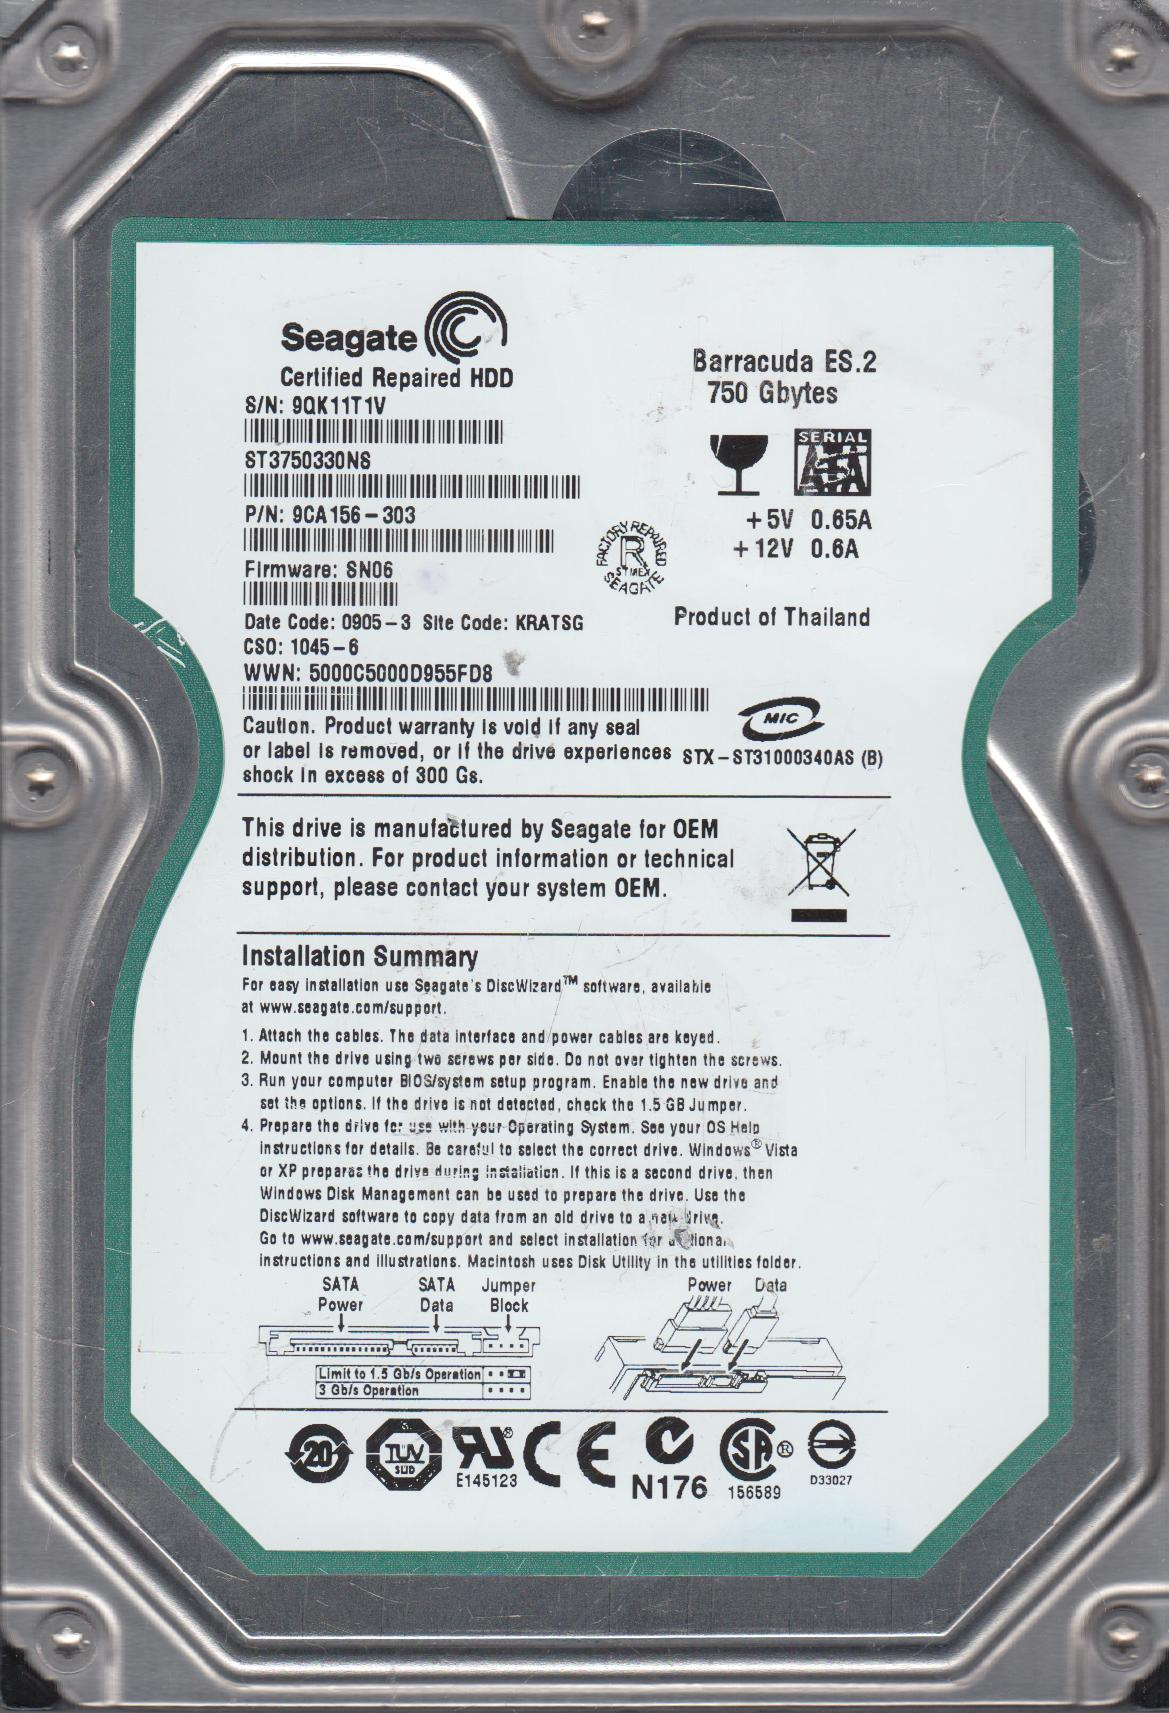 ST3750330NS, 9QK, KRATSG, PN 9CA156-303, FW SN06, Seagate 750GB SATA 3.5 Hard Drive by Seagate